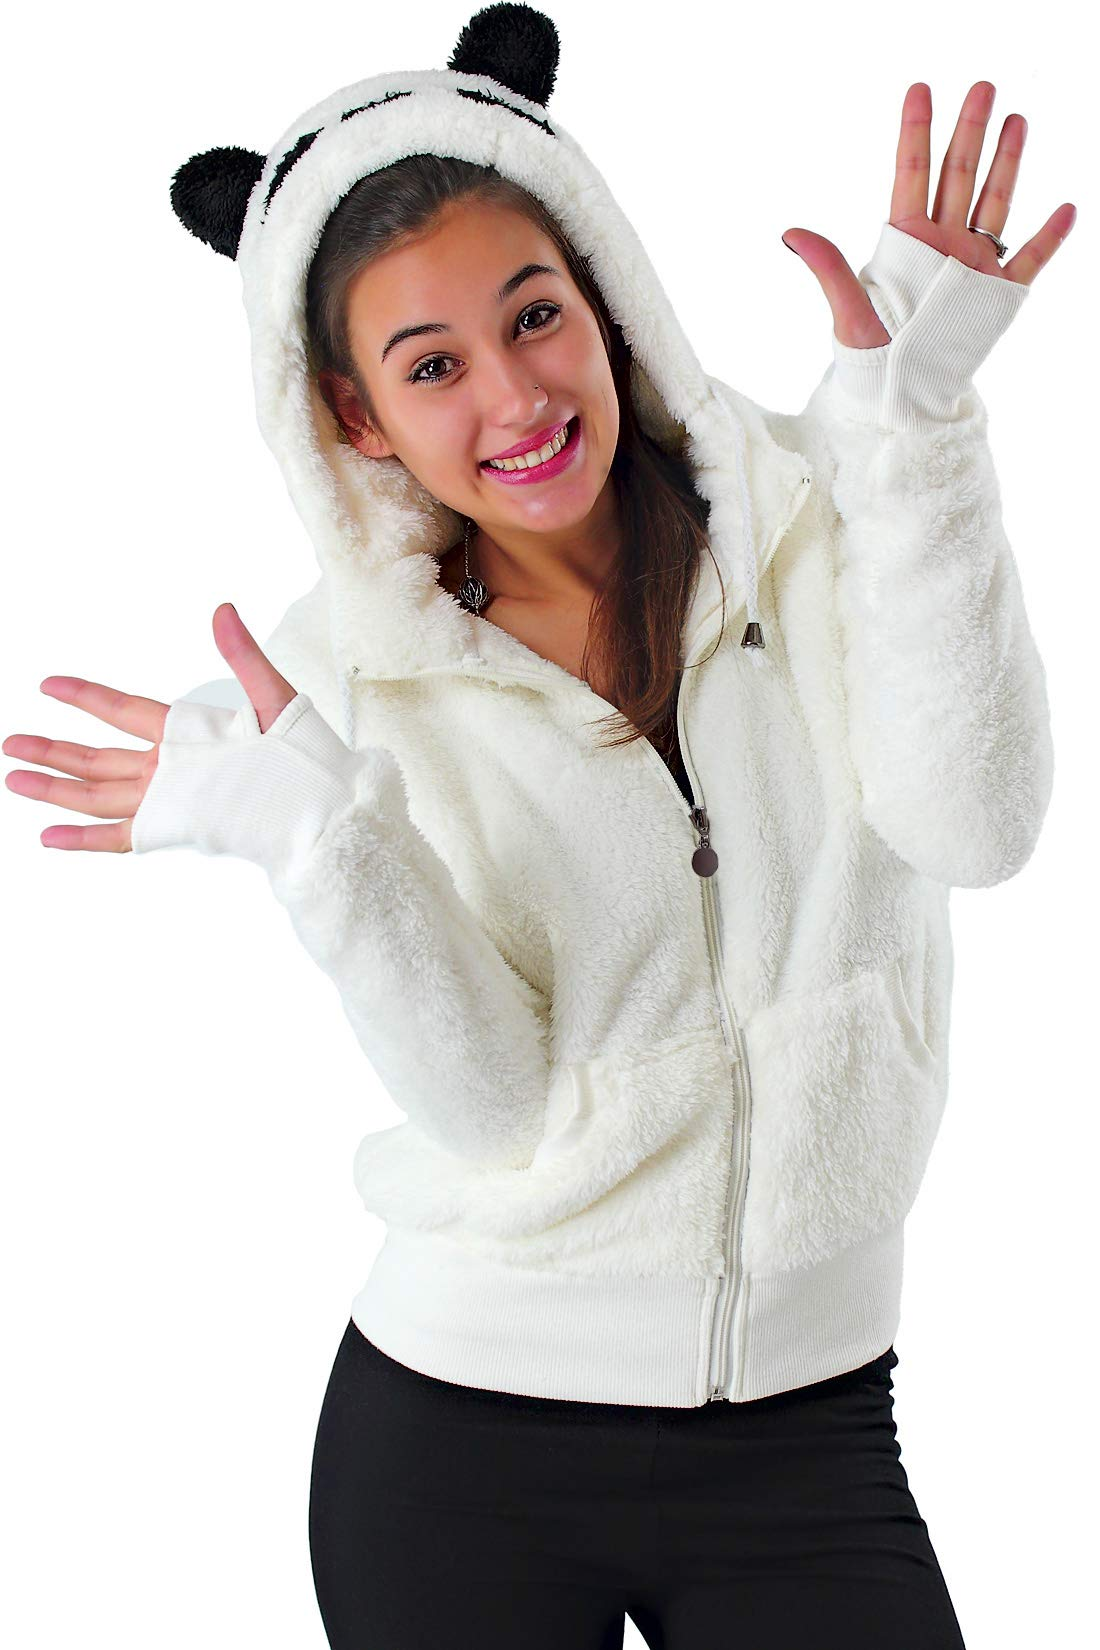 48780bfb8330 Felpa Donna con Cappuccio Orecchie Orso Panda Pelliccia Animal Zip Giacca  Kawaii S35 product image